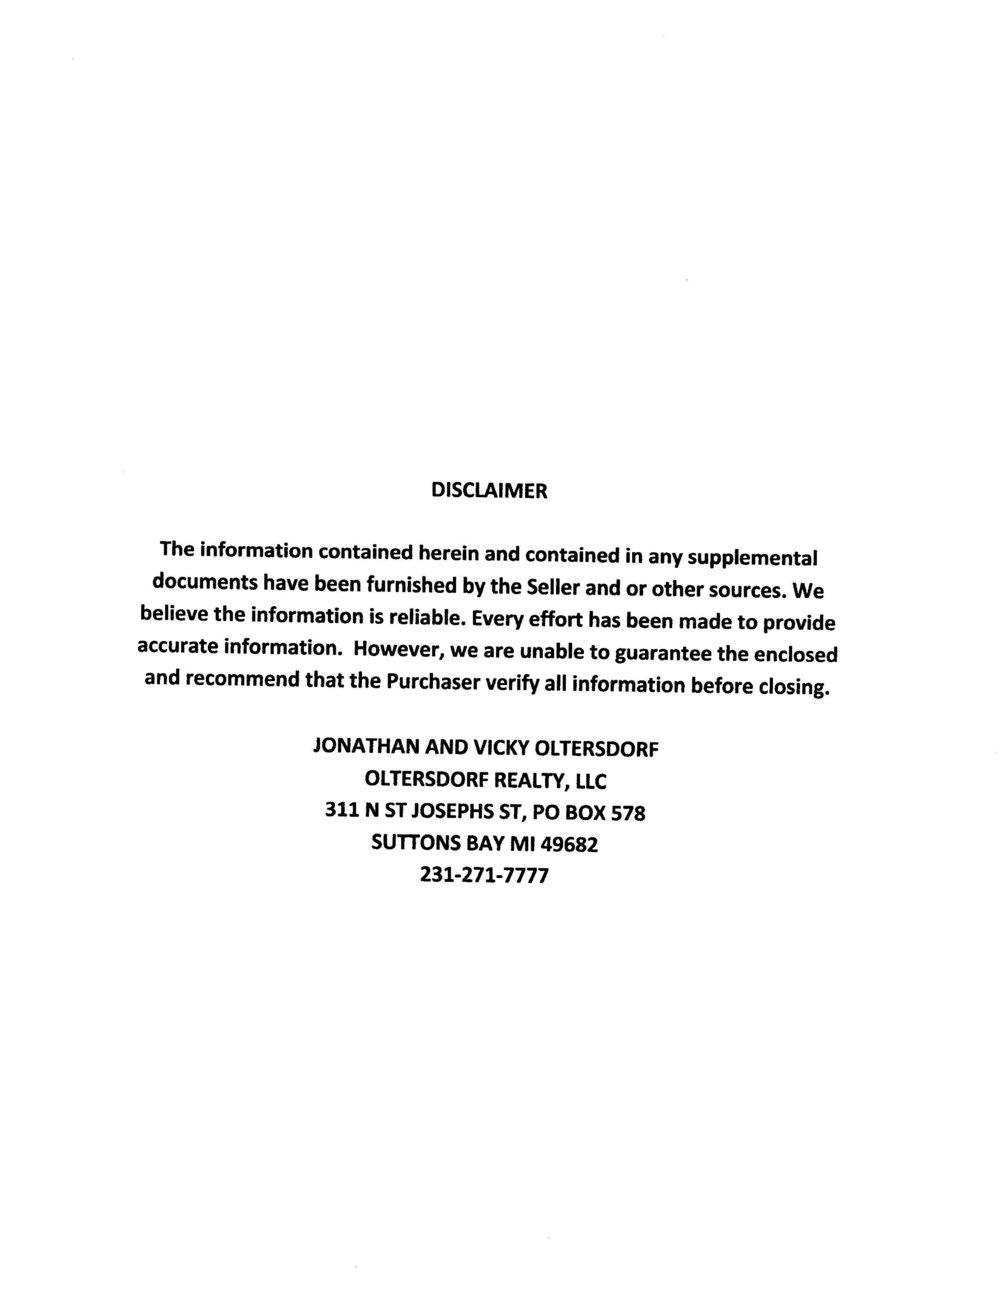 7311 S Lake Leelanau Drive, Traverse City Acreage for sale in Leelanau County by Oltersdorf Realty LLC (31).jpg